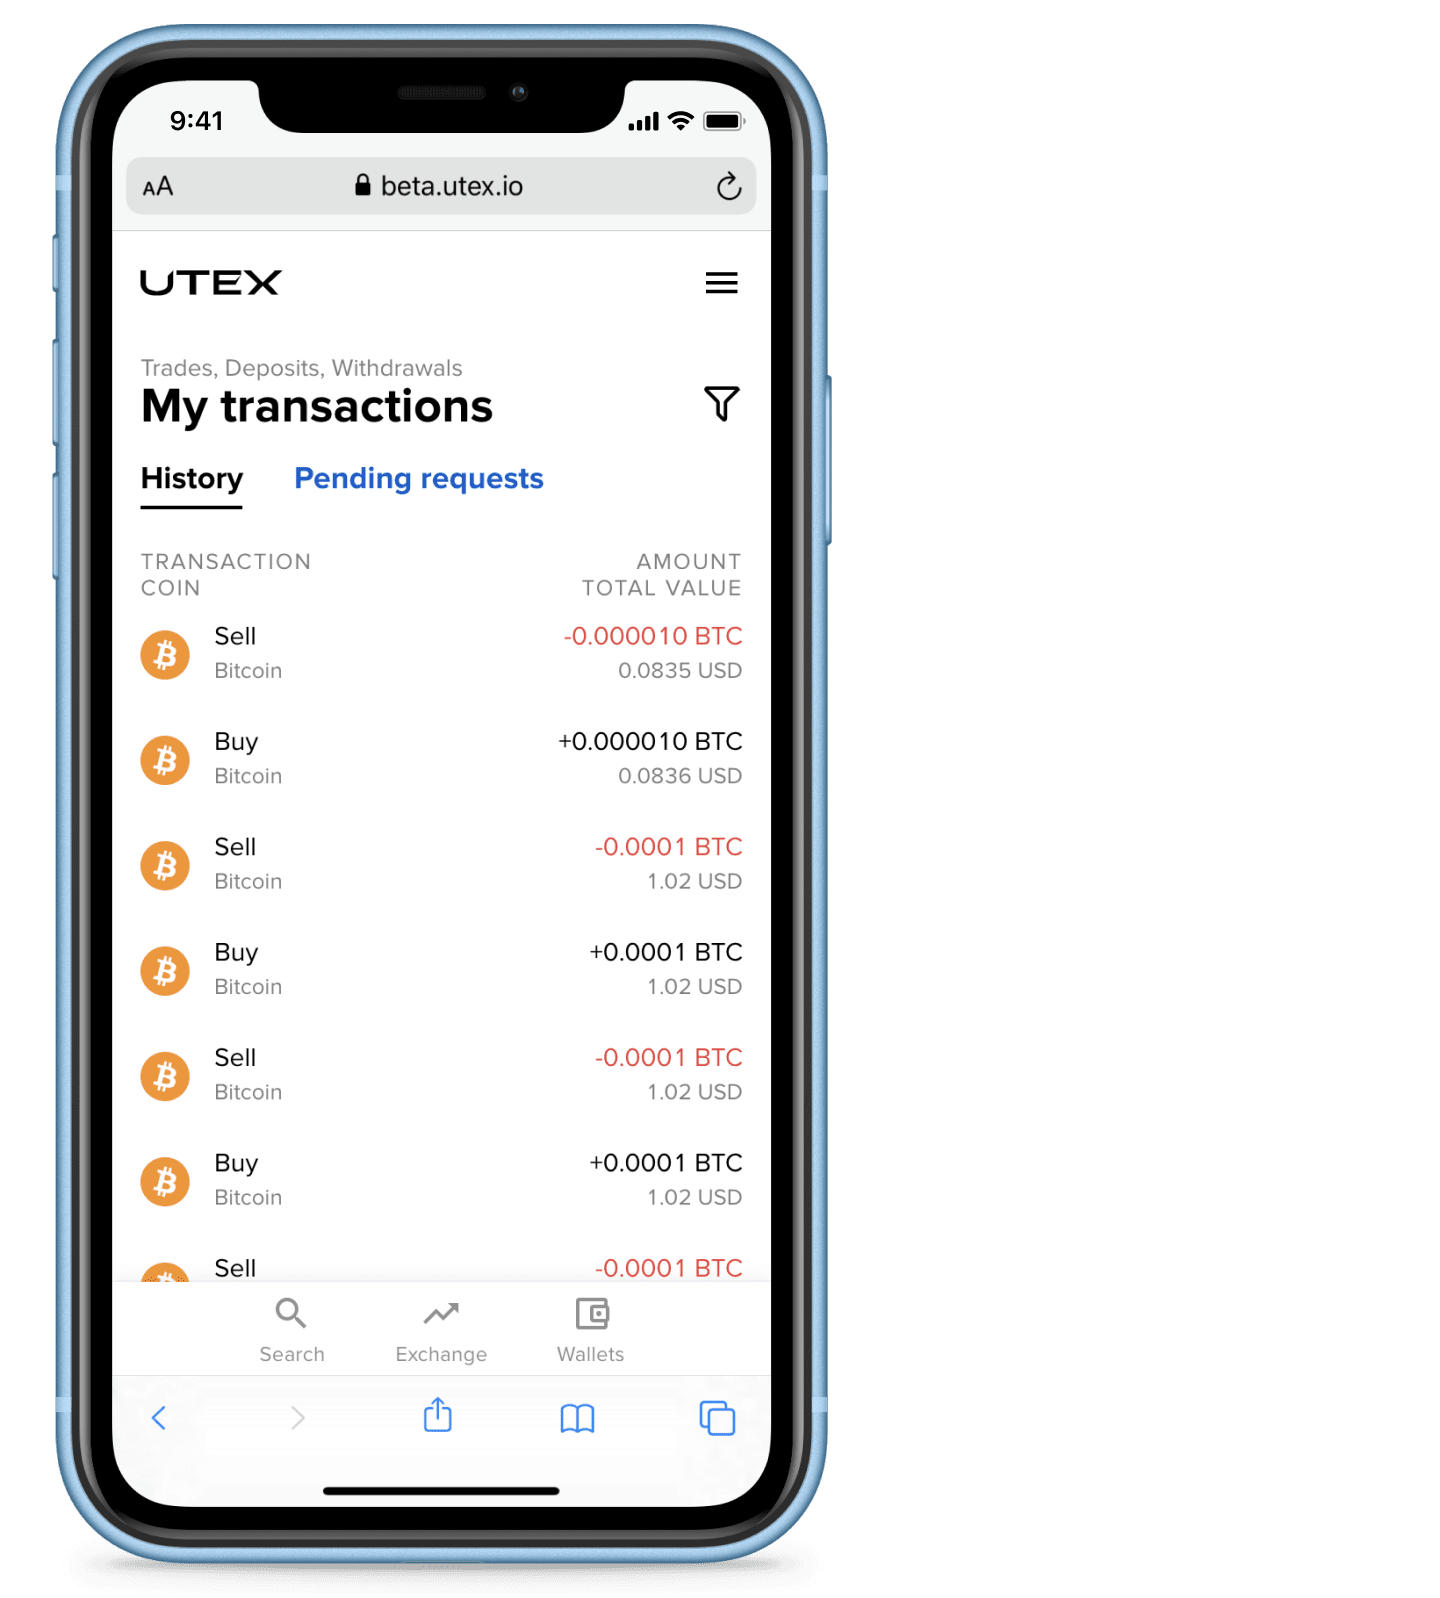 Transactions history